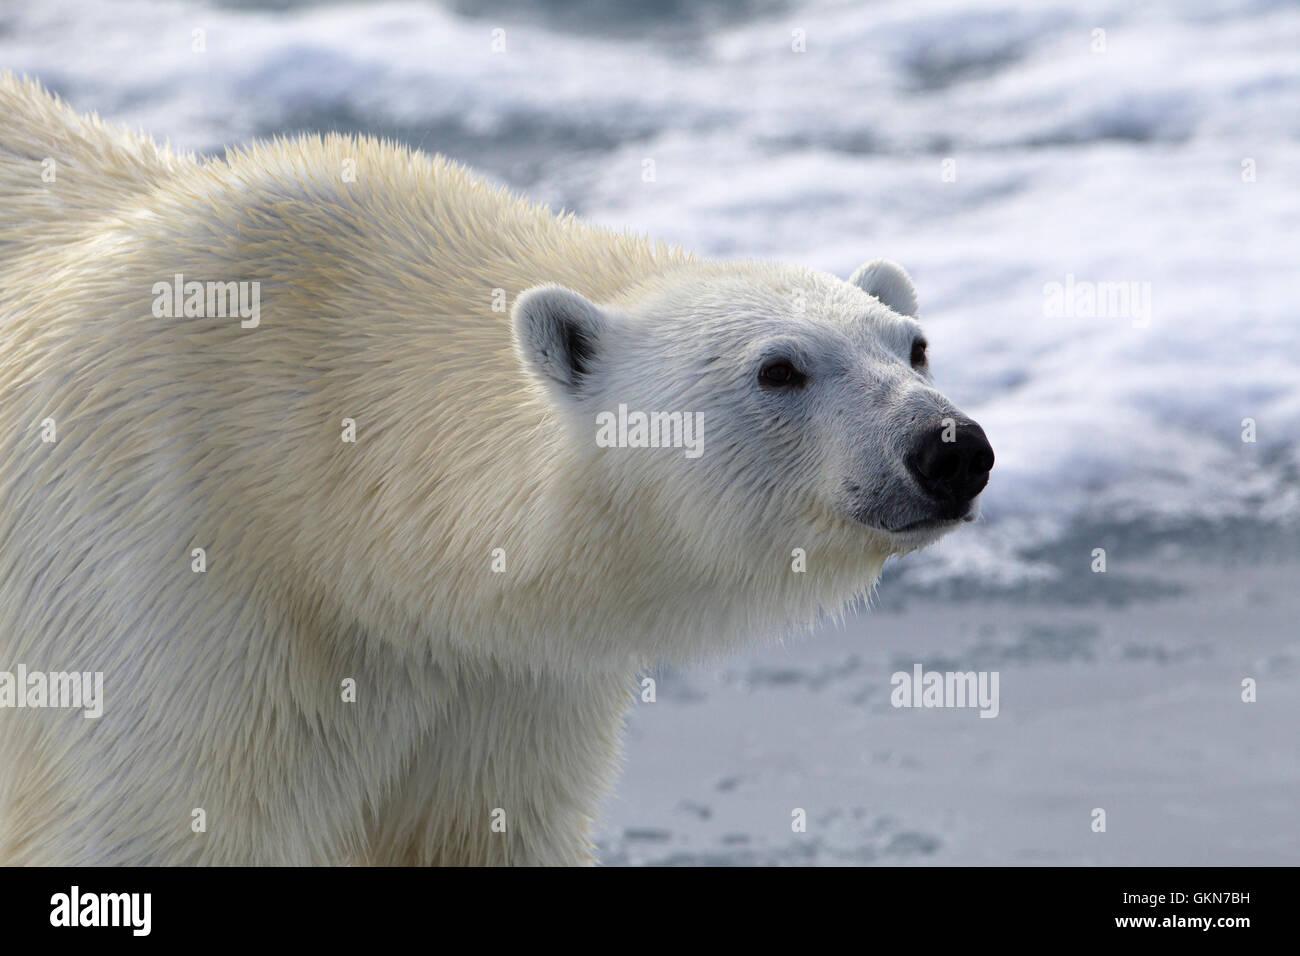 Visage de Polar Bear in close up Photo Stock